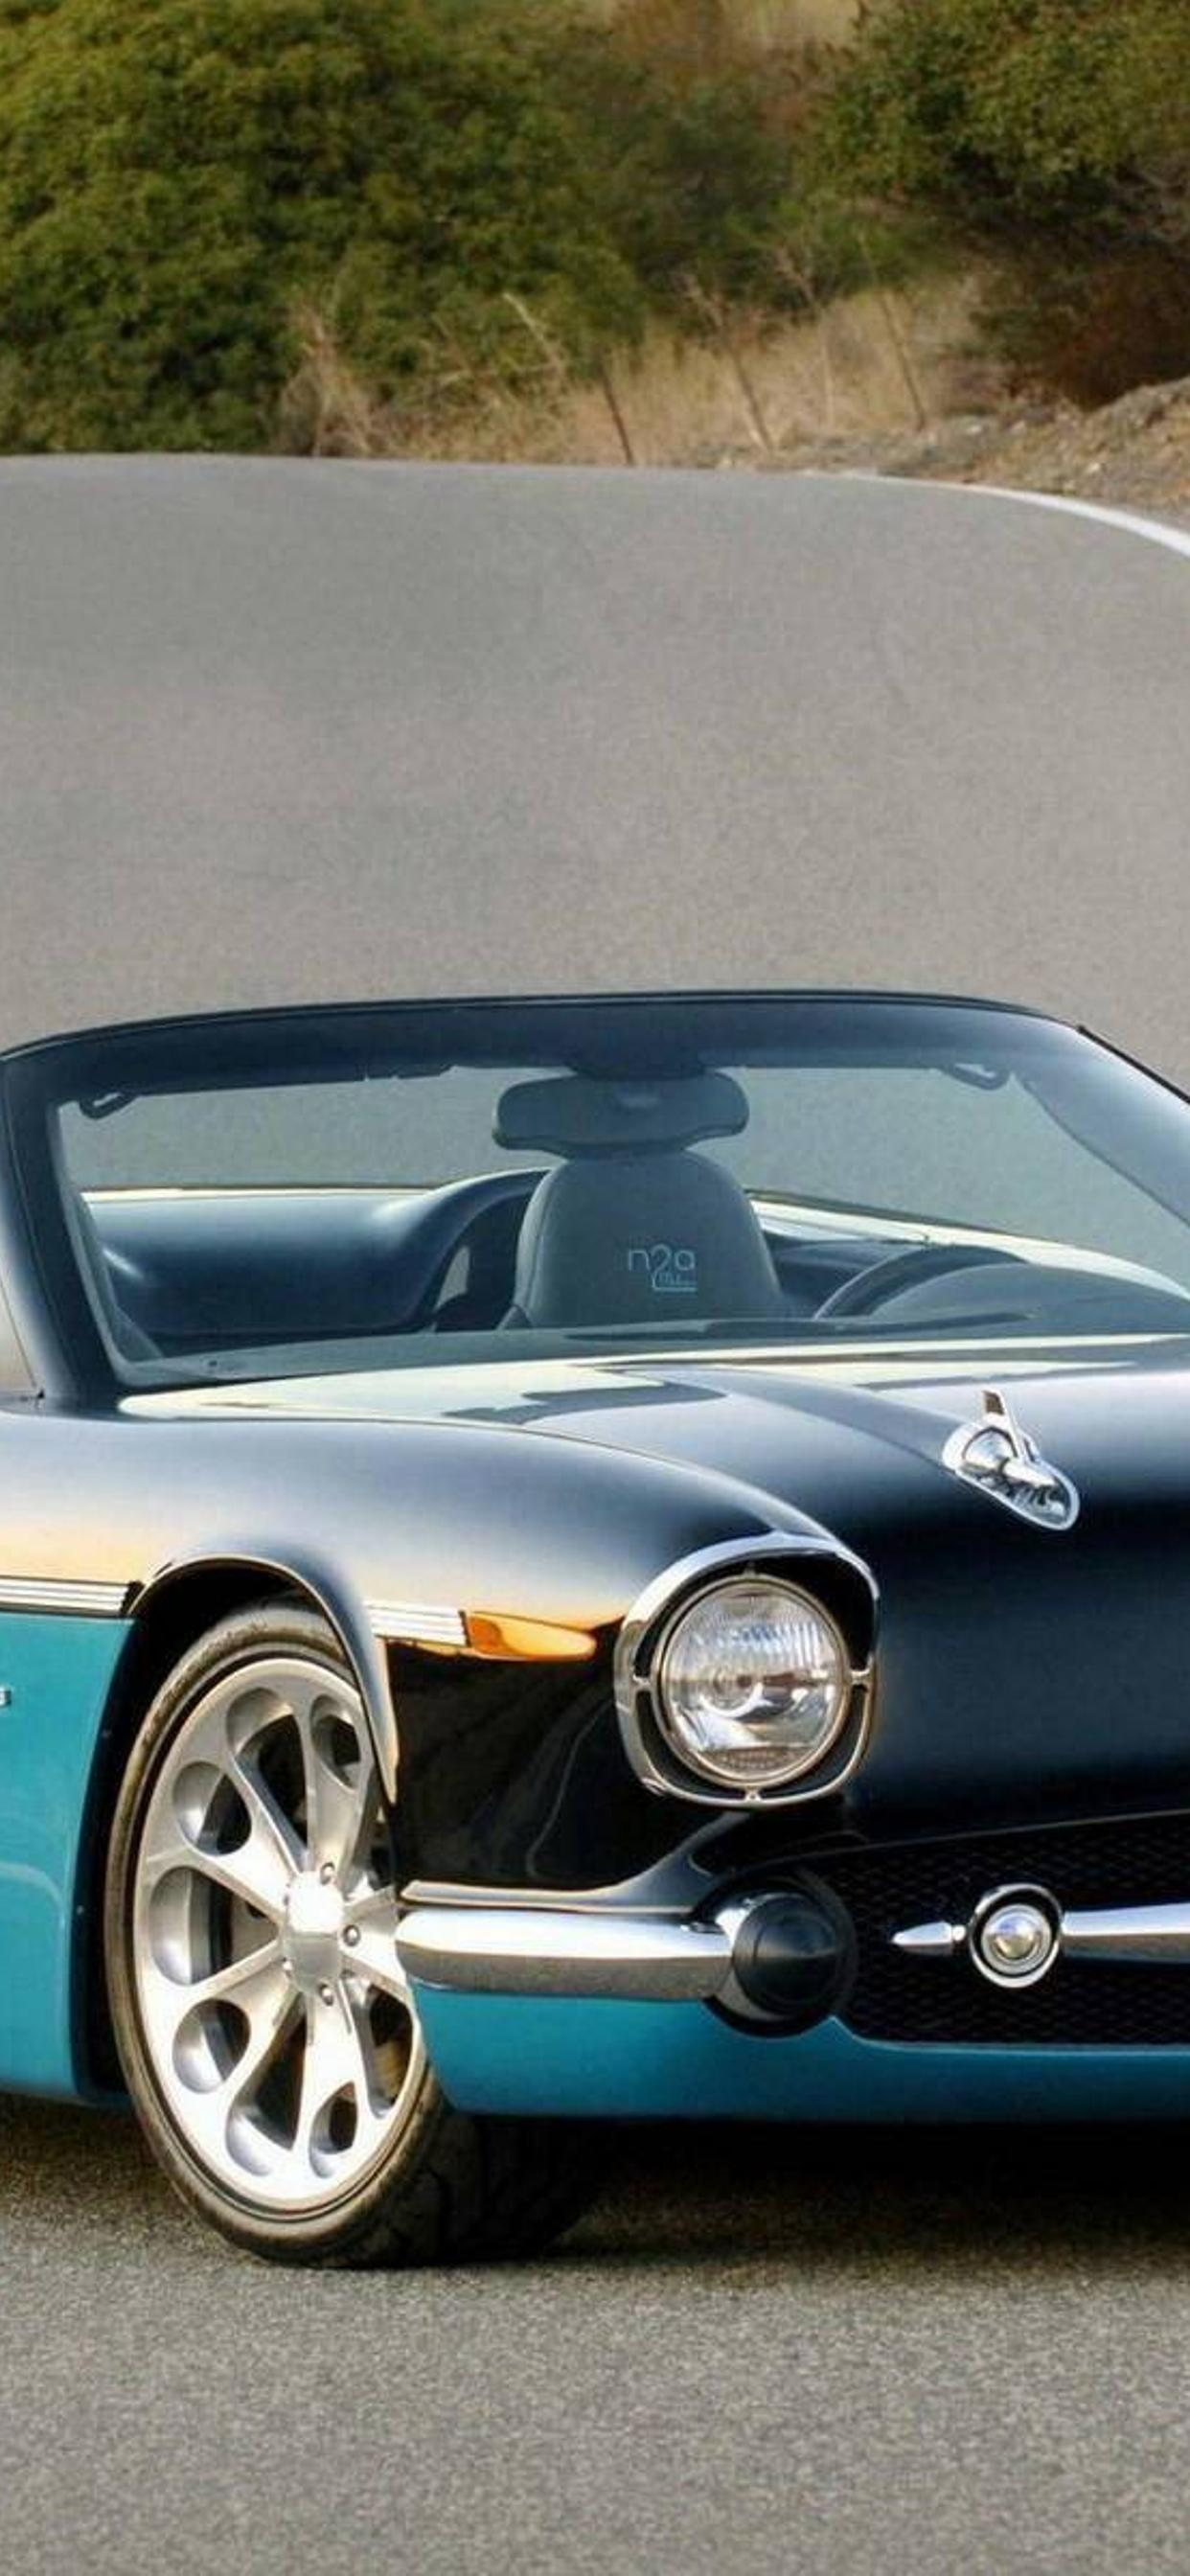 Beautiful Classic Car On The Road Hd Wallpaper